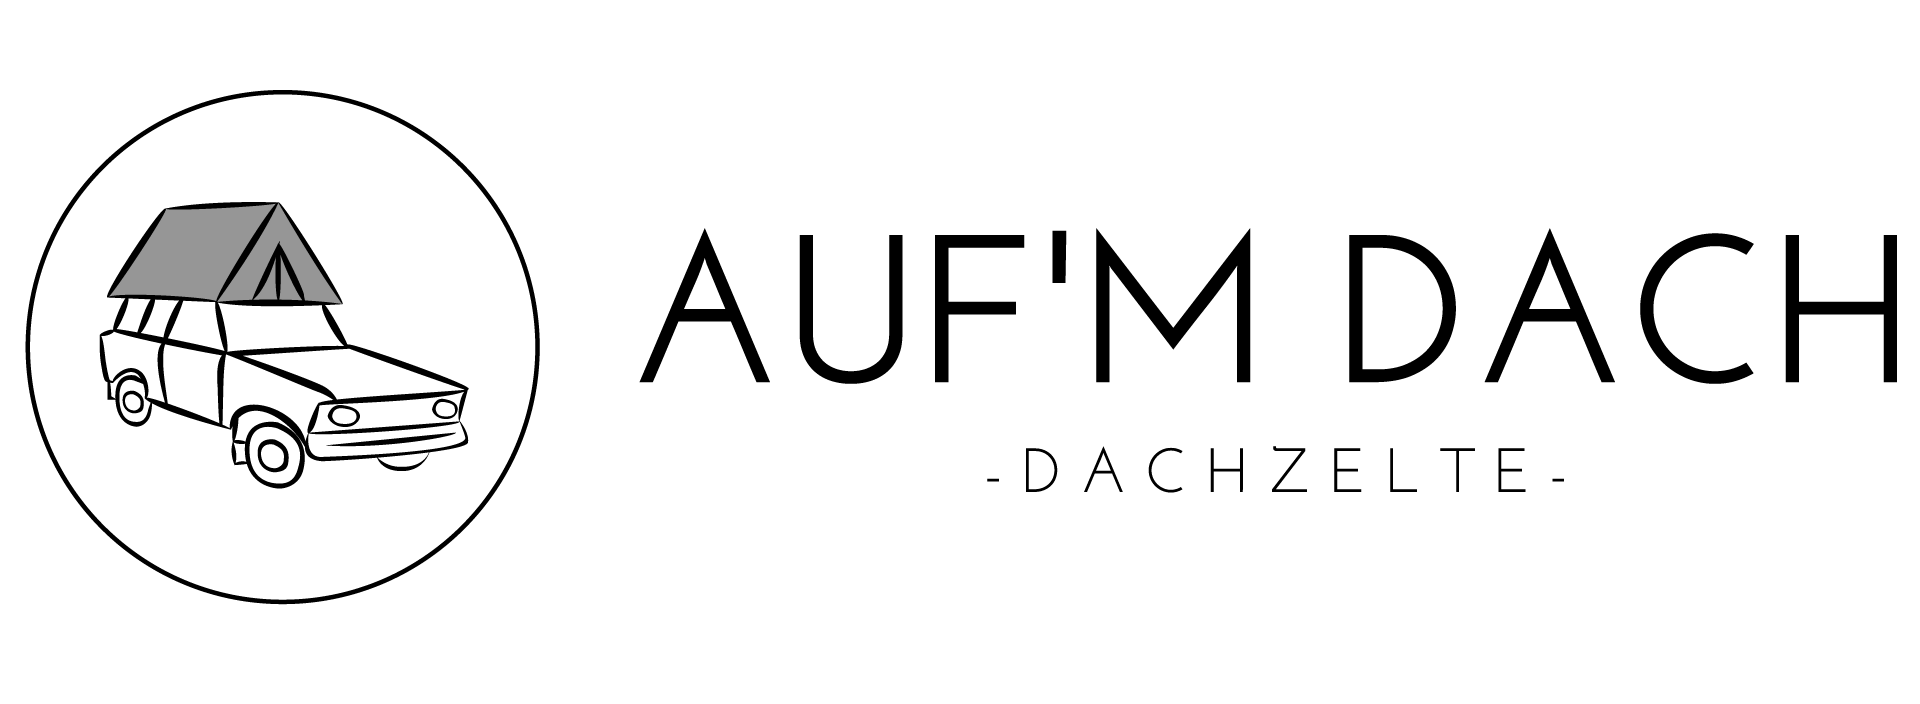 AUFMDACH_dachzelte-dachzeltnomaden-banner-footer